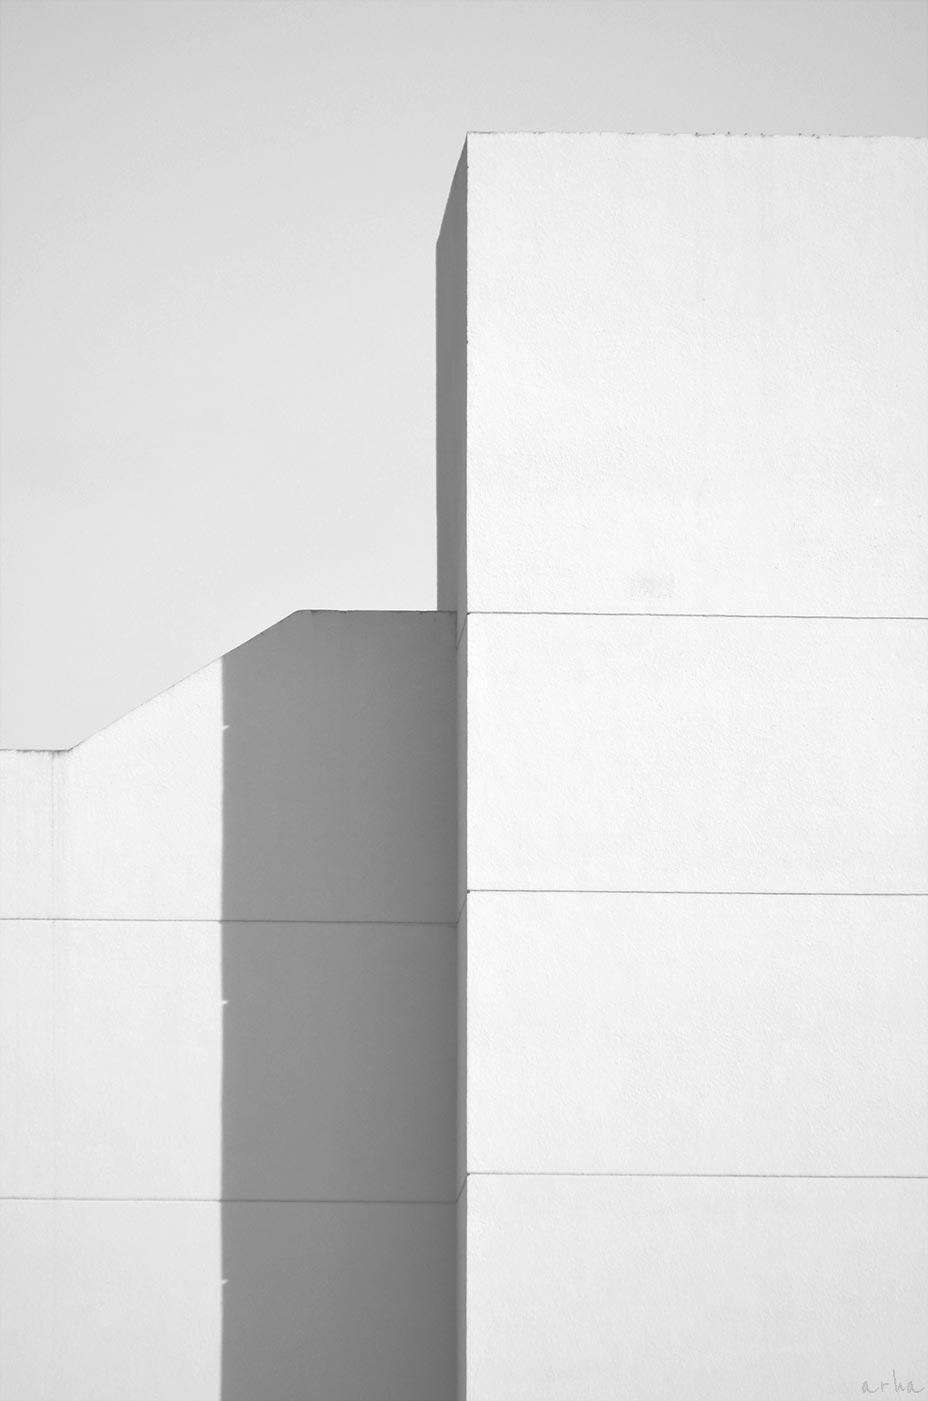 Pale-san-vitores-rd-copyright-2012-arha-Tomomichi-Morifuji